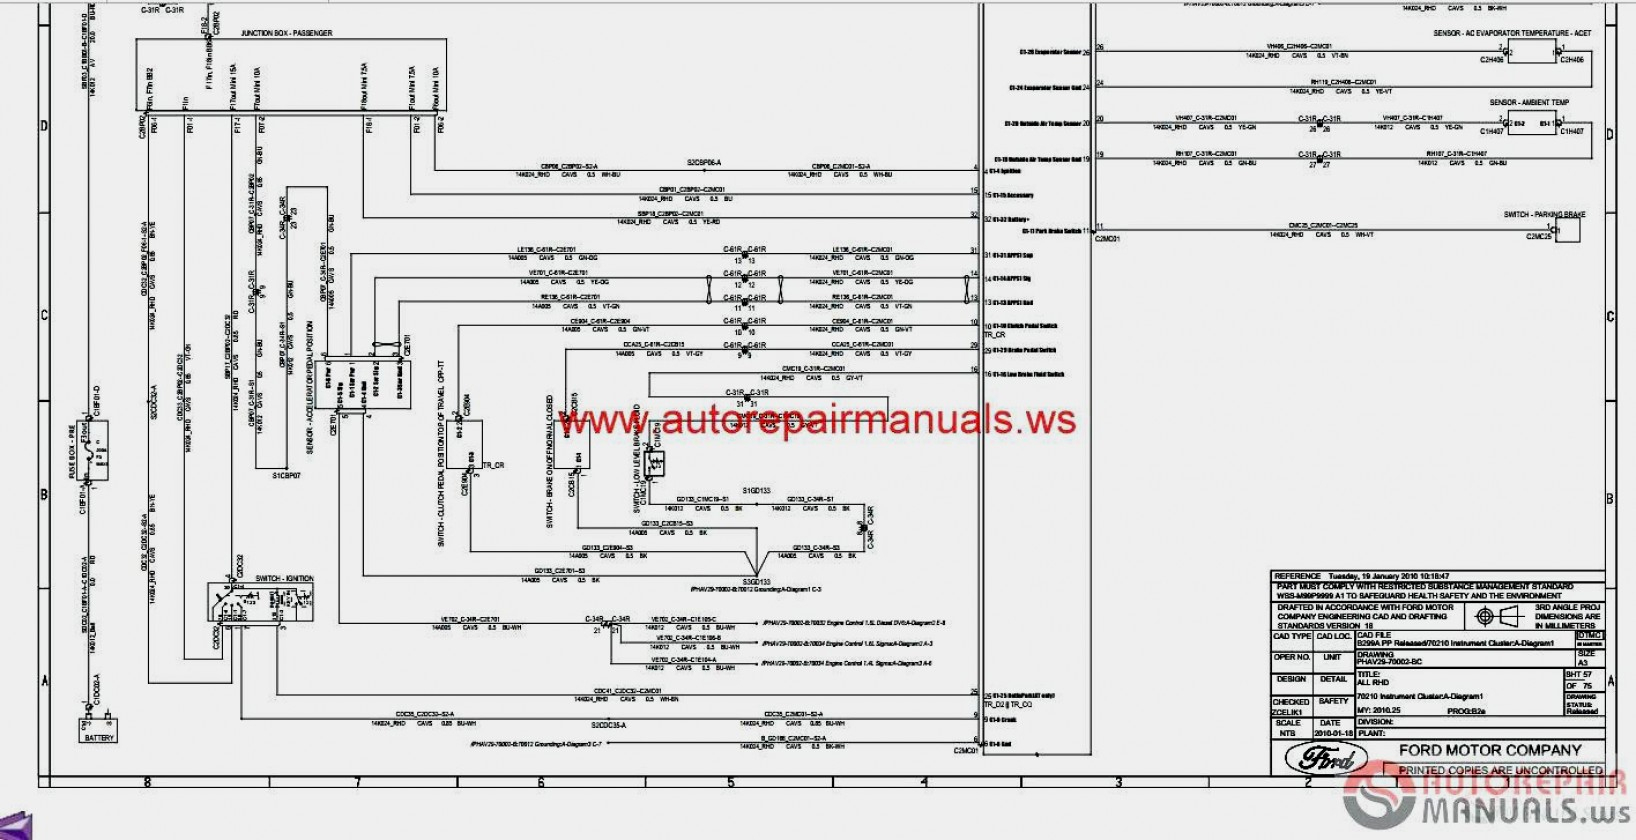 Diagram Of Bunker - Wiring Diagram Database - Bunker Hill Security Camera Wiring Diagram